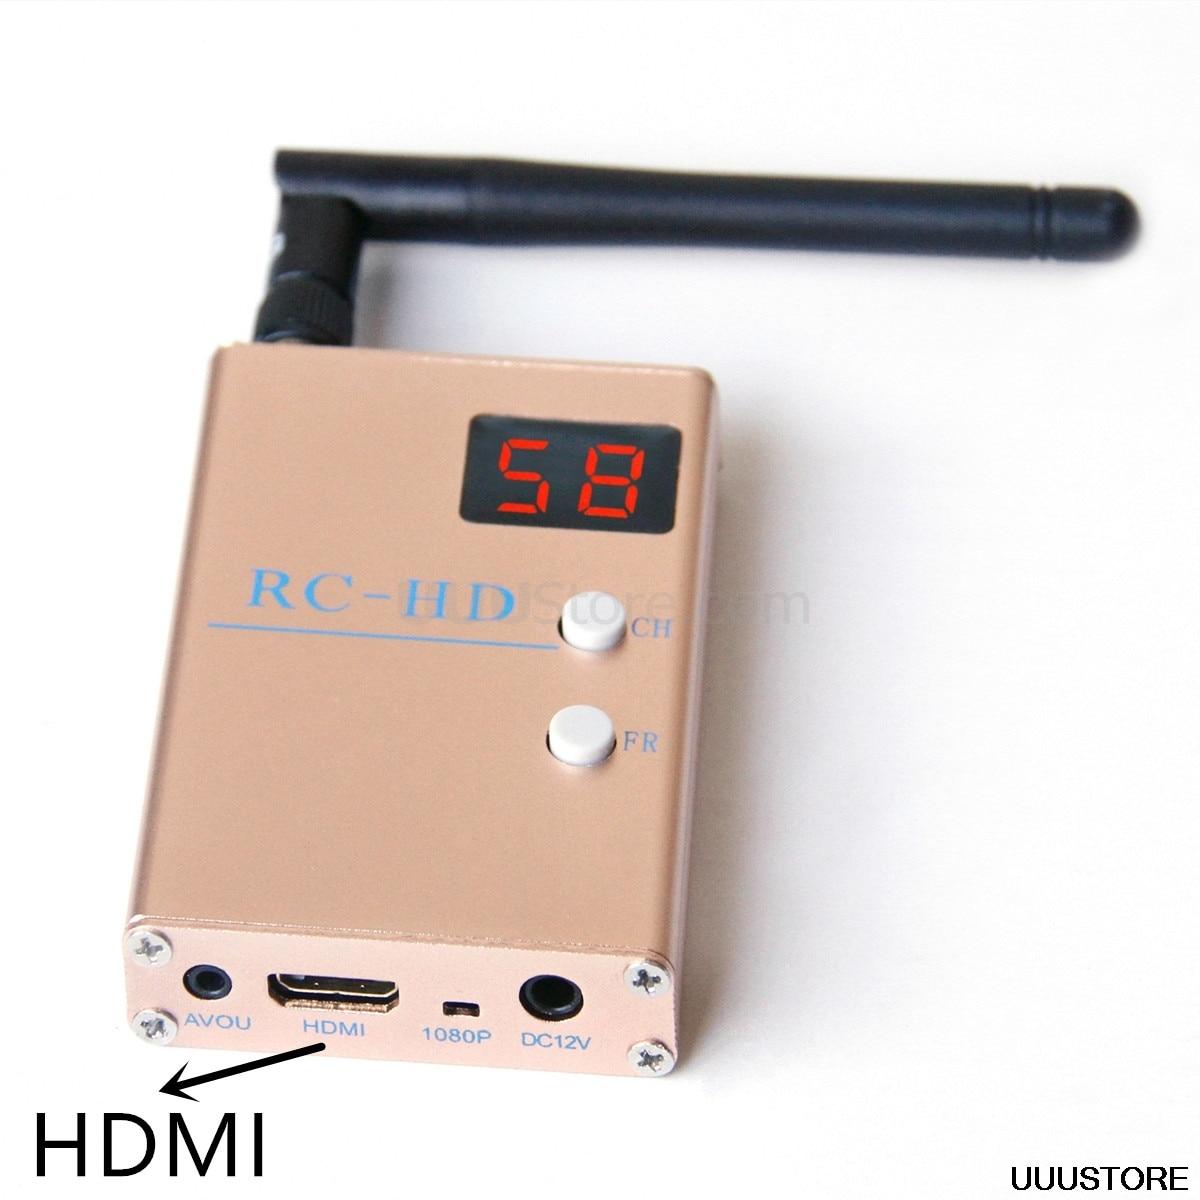 FPV 5.8G 5.8GHz 48CH 48 قنوات RC832HD RC-HD استقبال HDMI مع A/V و الطاقة كابلات ل Quadcopter F450 S500 S550 RC832